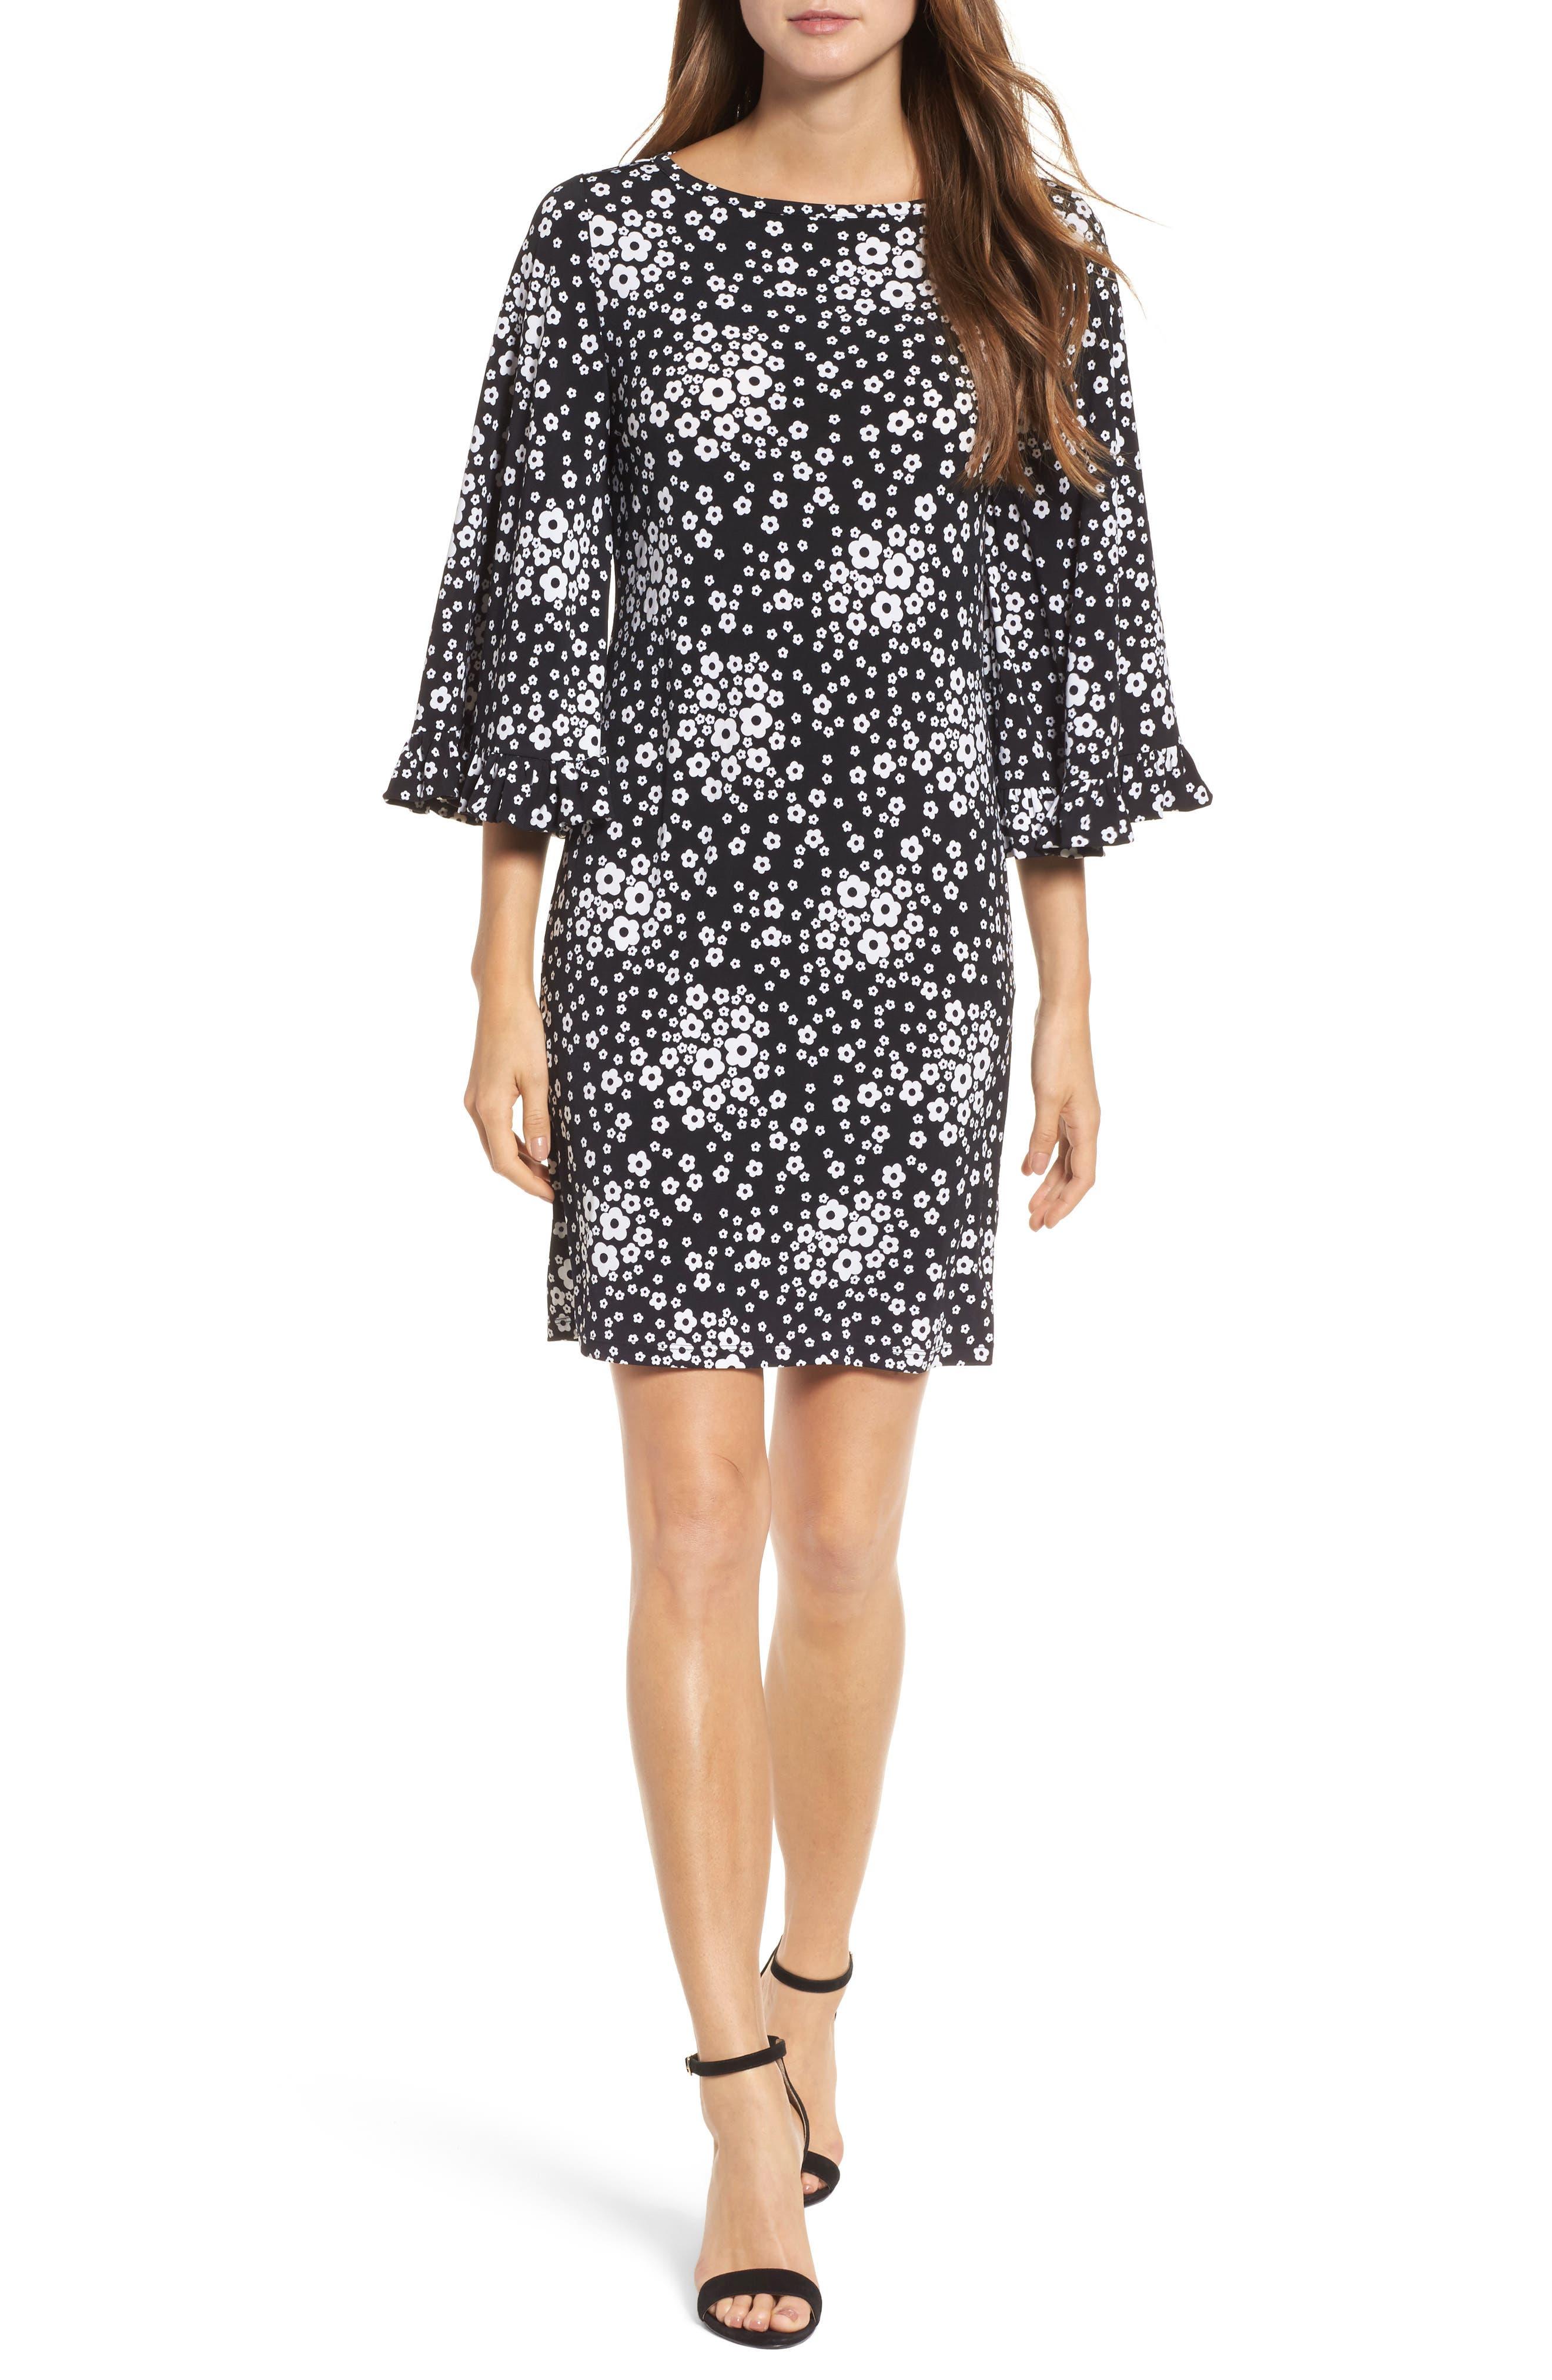 Floral Mod Shift Dress,                             Main thumbnail 1, color,                             Black/ White